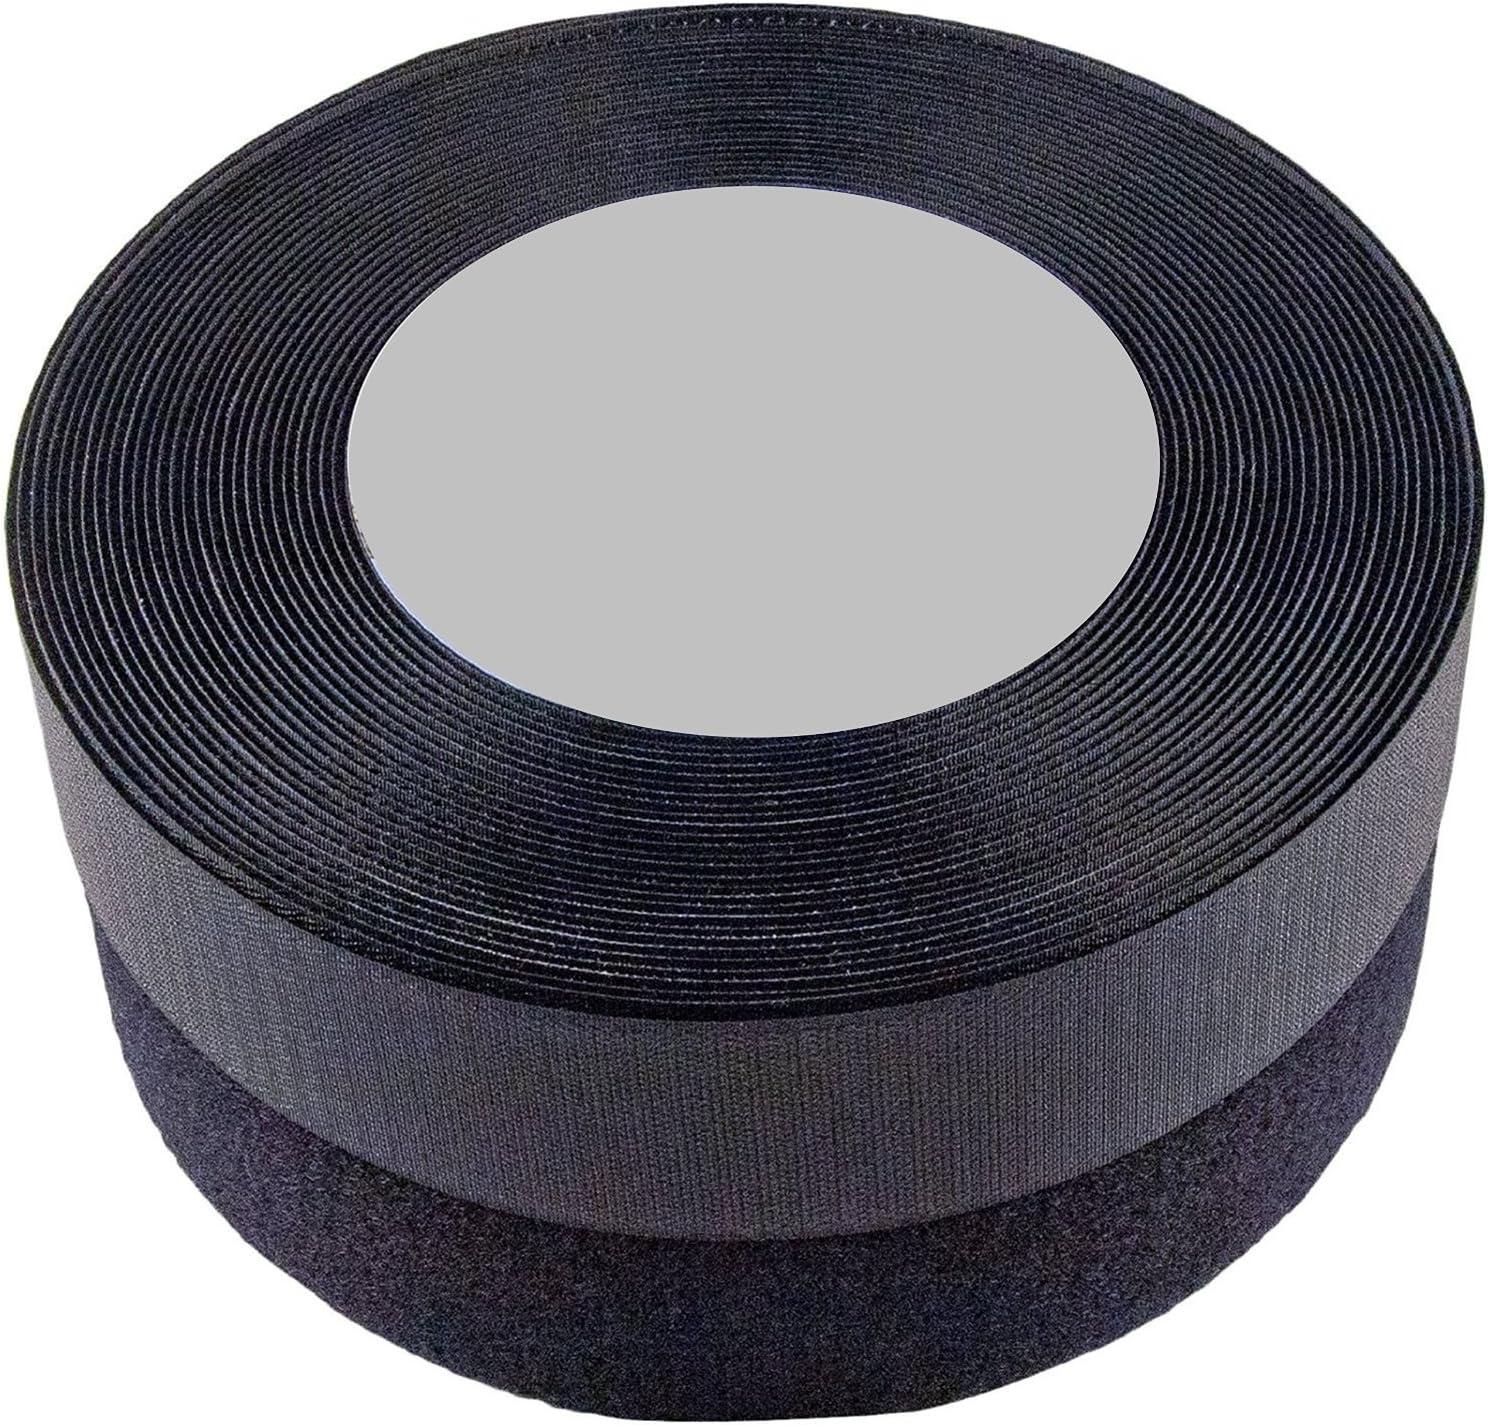 1.5 inch, 10 yards SPARIK ENJOY TM 1.5 Inches Black Sew on Hook and Loop Strips Fabric